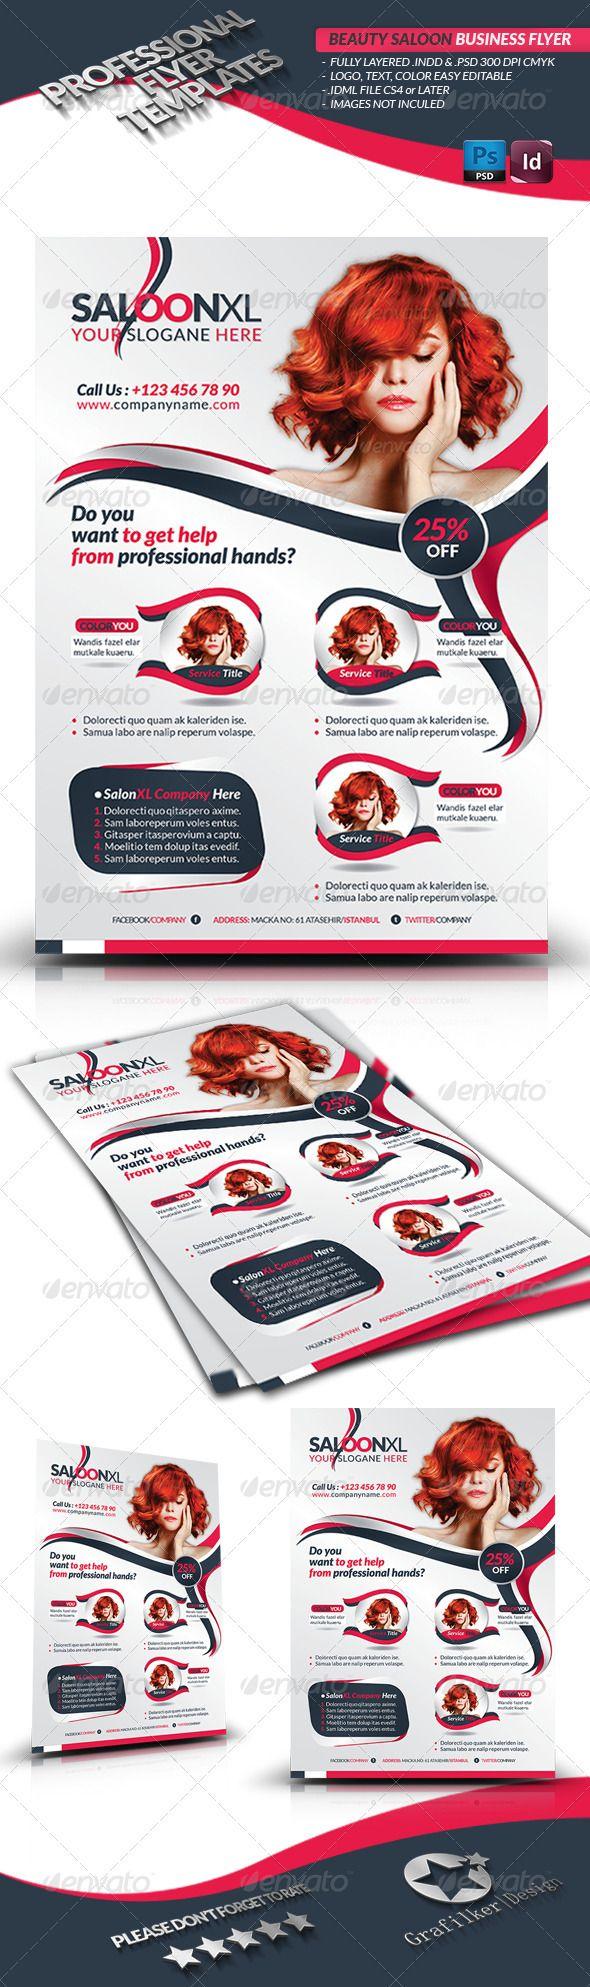 best ideas about format flyer brochures design beauty salon business flyer